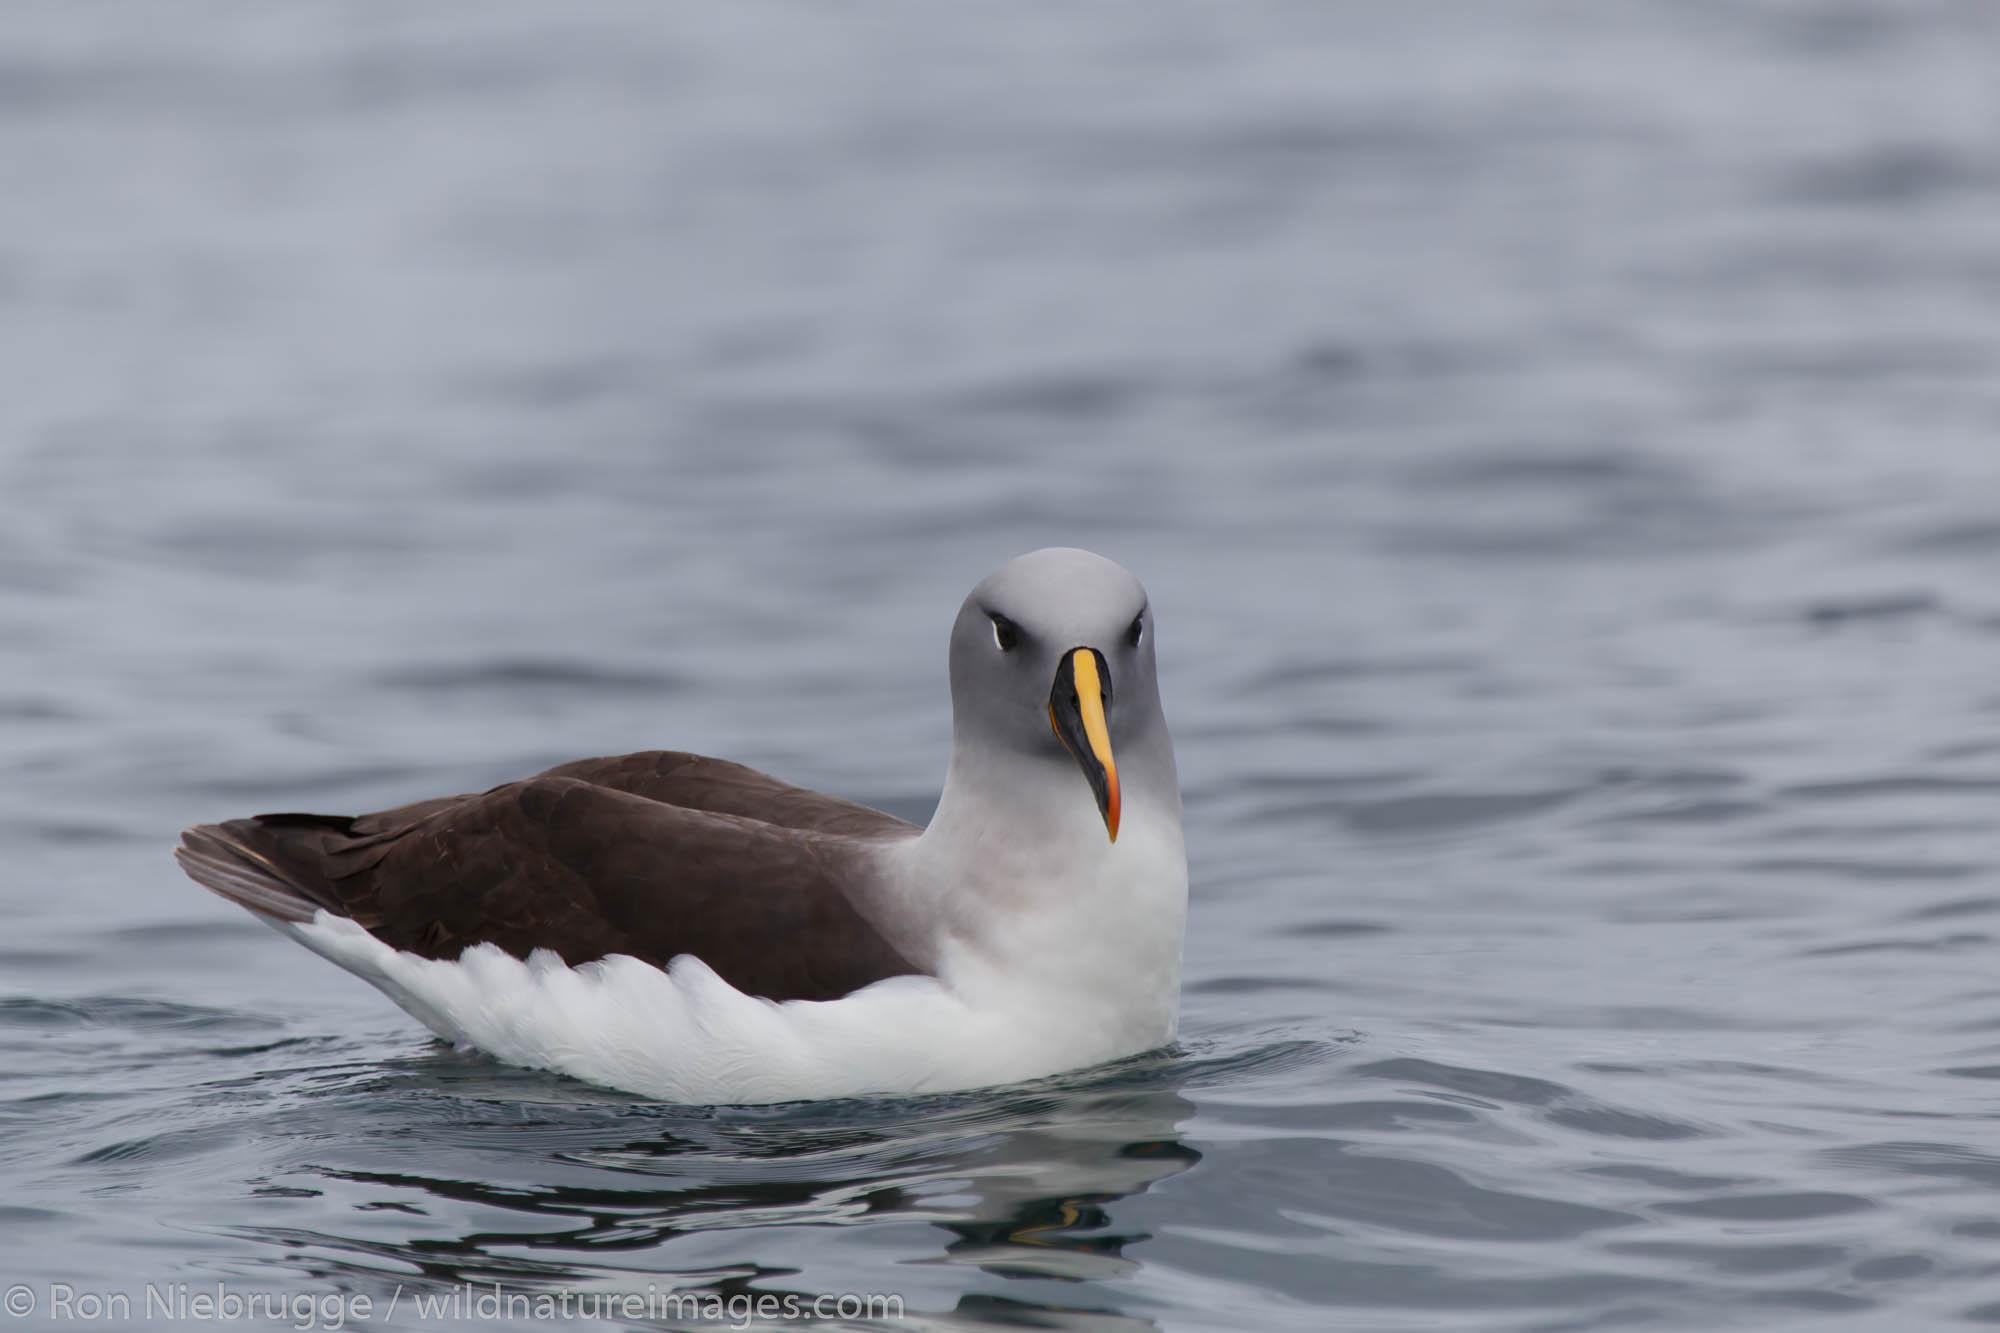 Grey-headed albatross (Thalassarche chrysostoma), Cooper Bay, South Georgia, Antarctica.